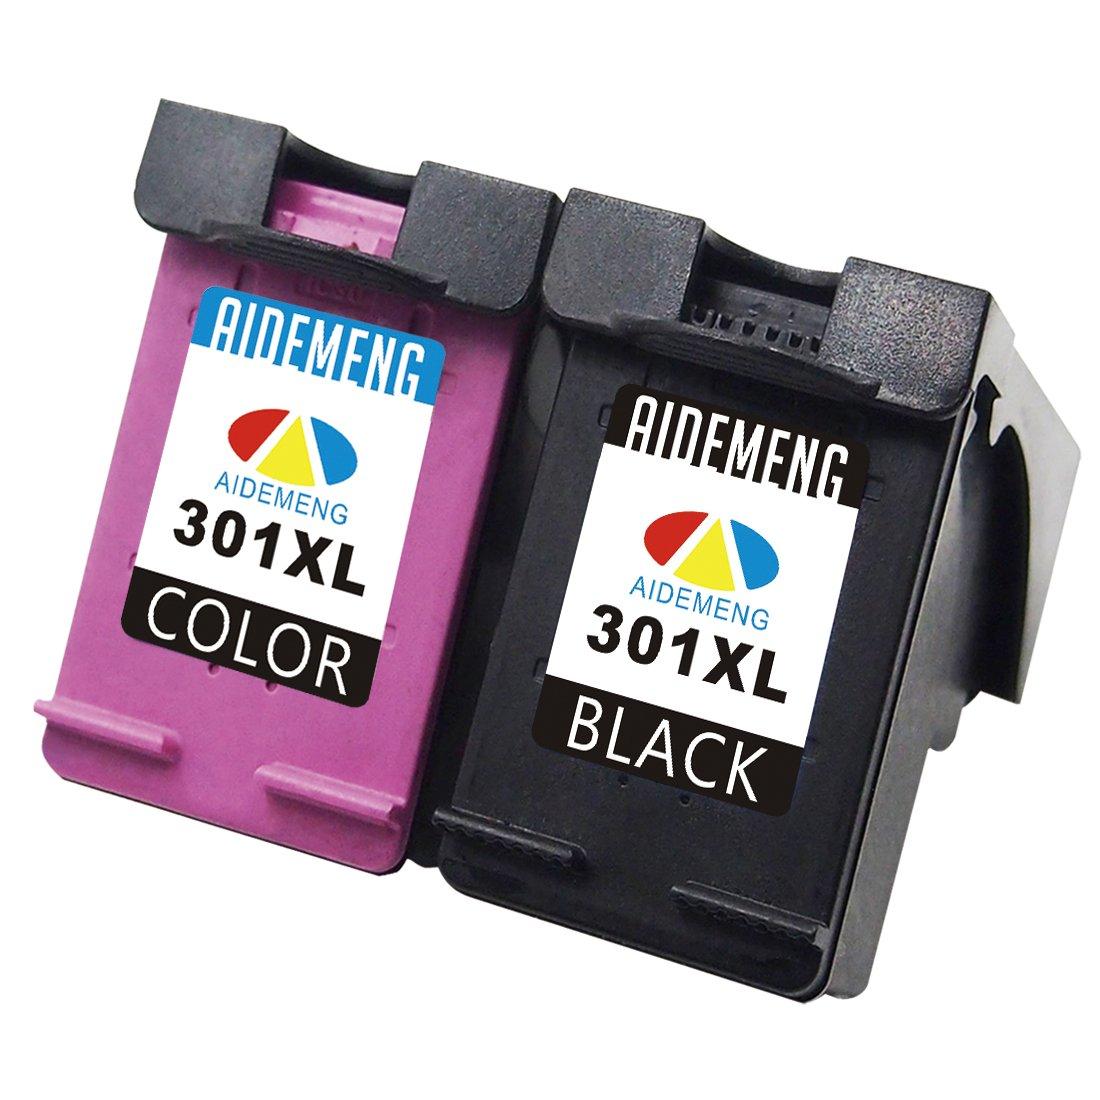 AideMeng Remanufacturado Reemplazo para HP 301 XL Cartuchos de tinta (1 Negro, 1 tricolor) Compatiable con HP Deskjet 1000 1010 1050 1050A 1510 1512 ...